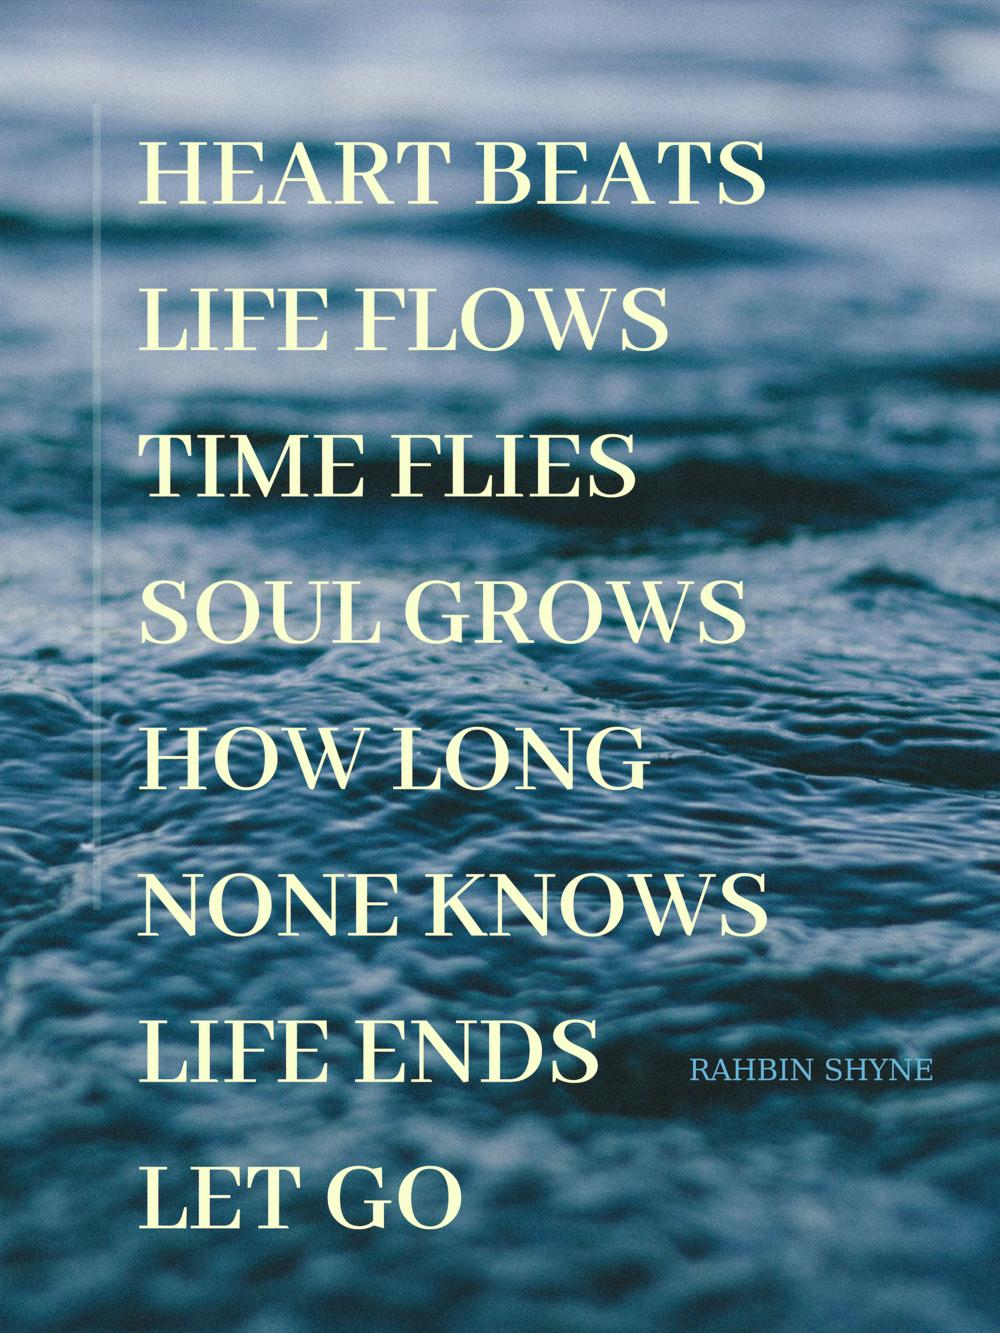 Heart Beats Poster.png